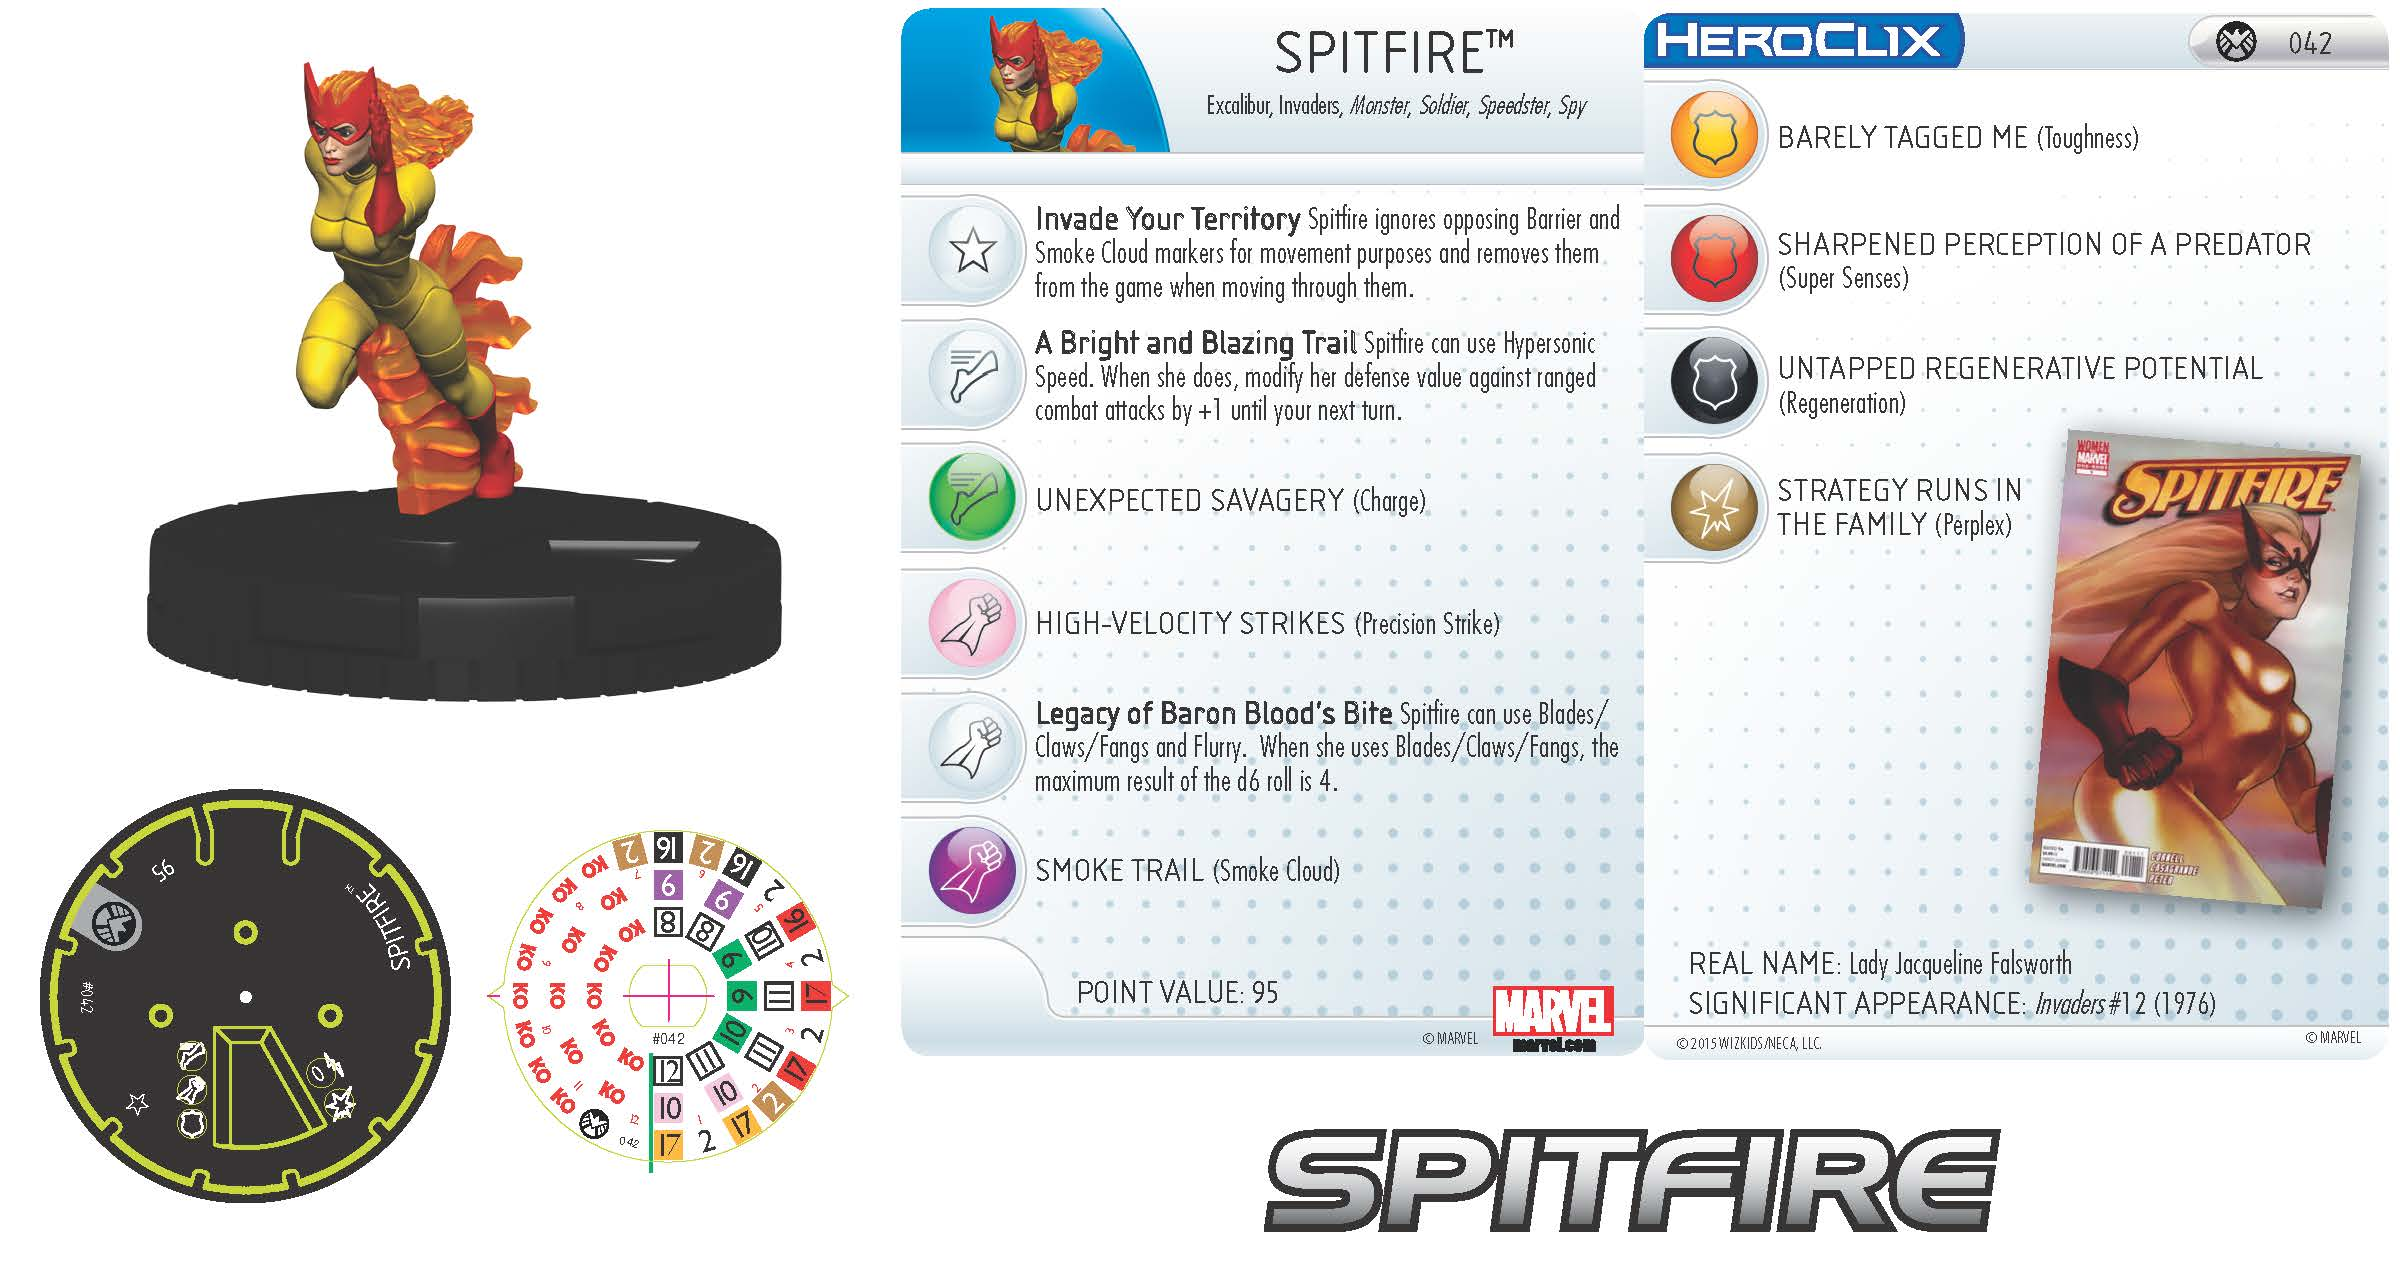 Marvel HeroClix: Nick Fury, Agent of S.H.I.E.L.D.- Spitfire